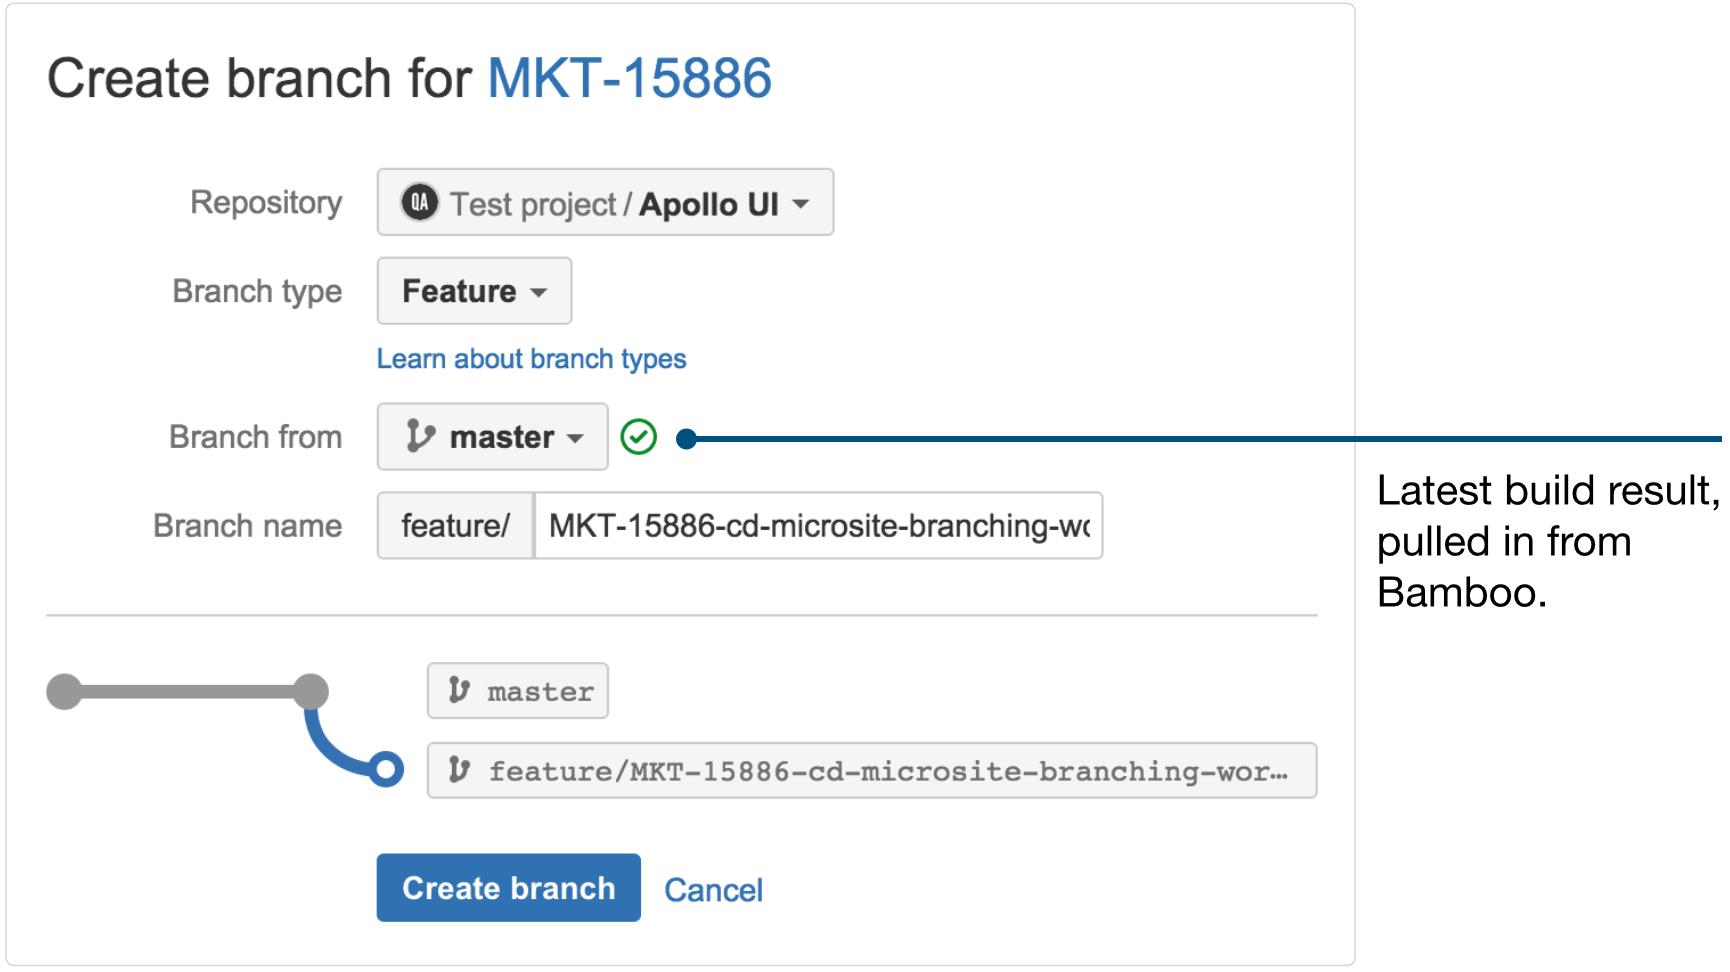 Create branch workflows screenshot | Atlassian CI/CD